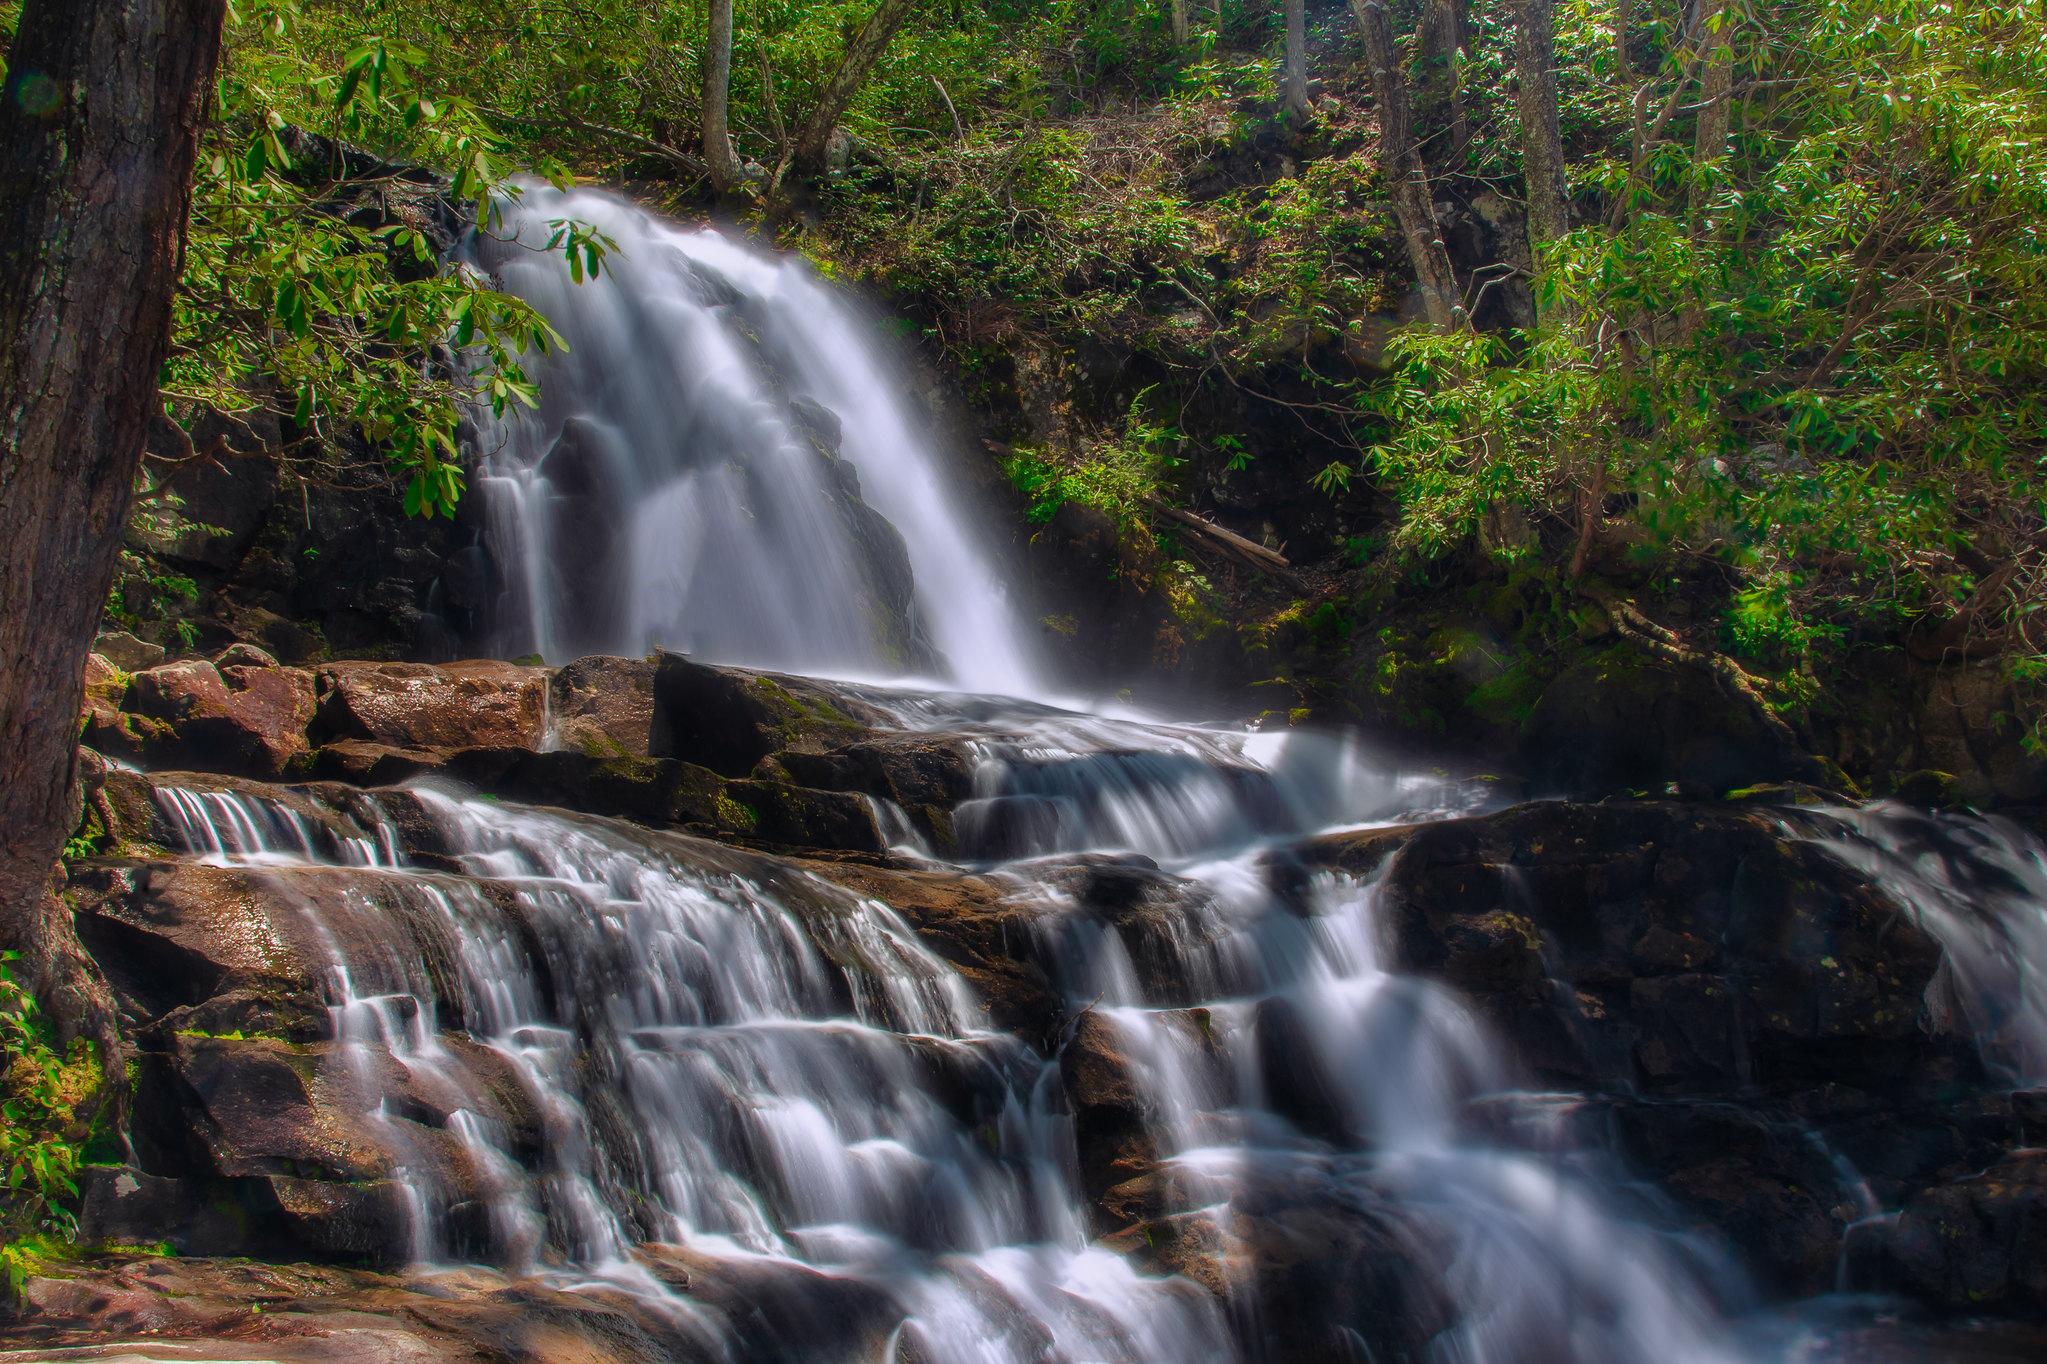 Laurel Falls Great Smoky Mountains National Park